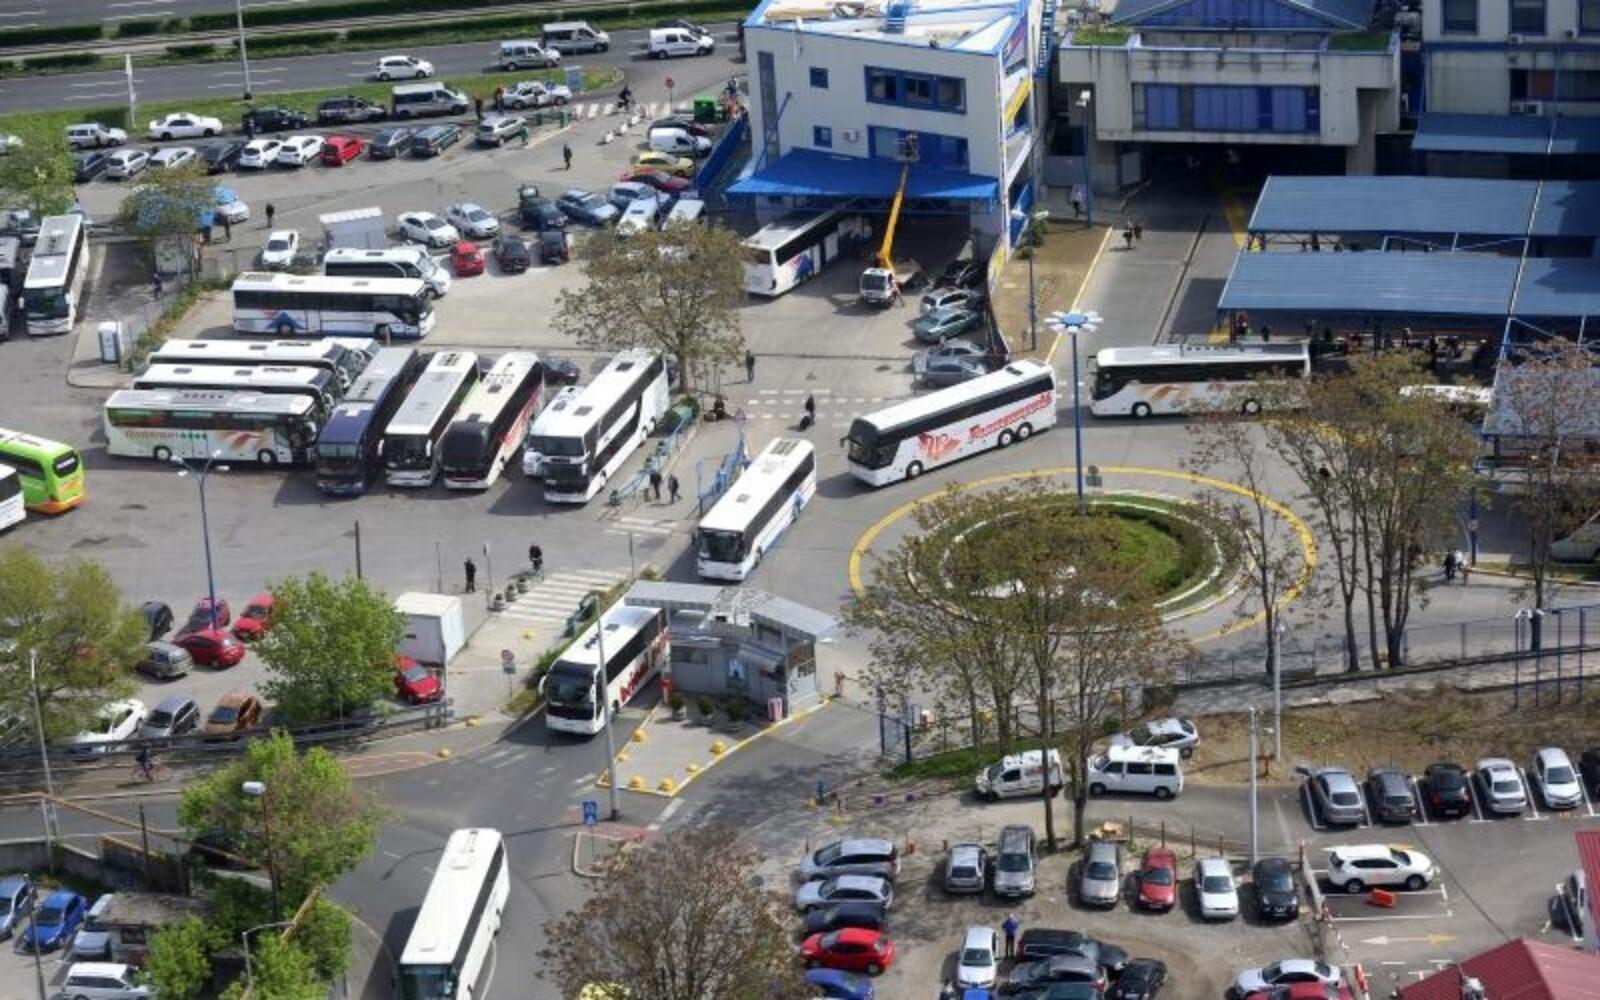 Zagrebacki Autobusni Kolodvor Ide U Rekonstrukciju Poslovni Dnevnik